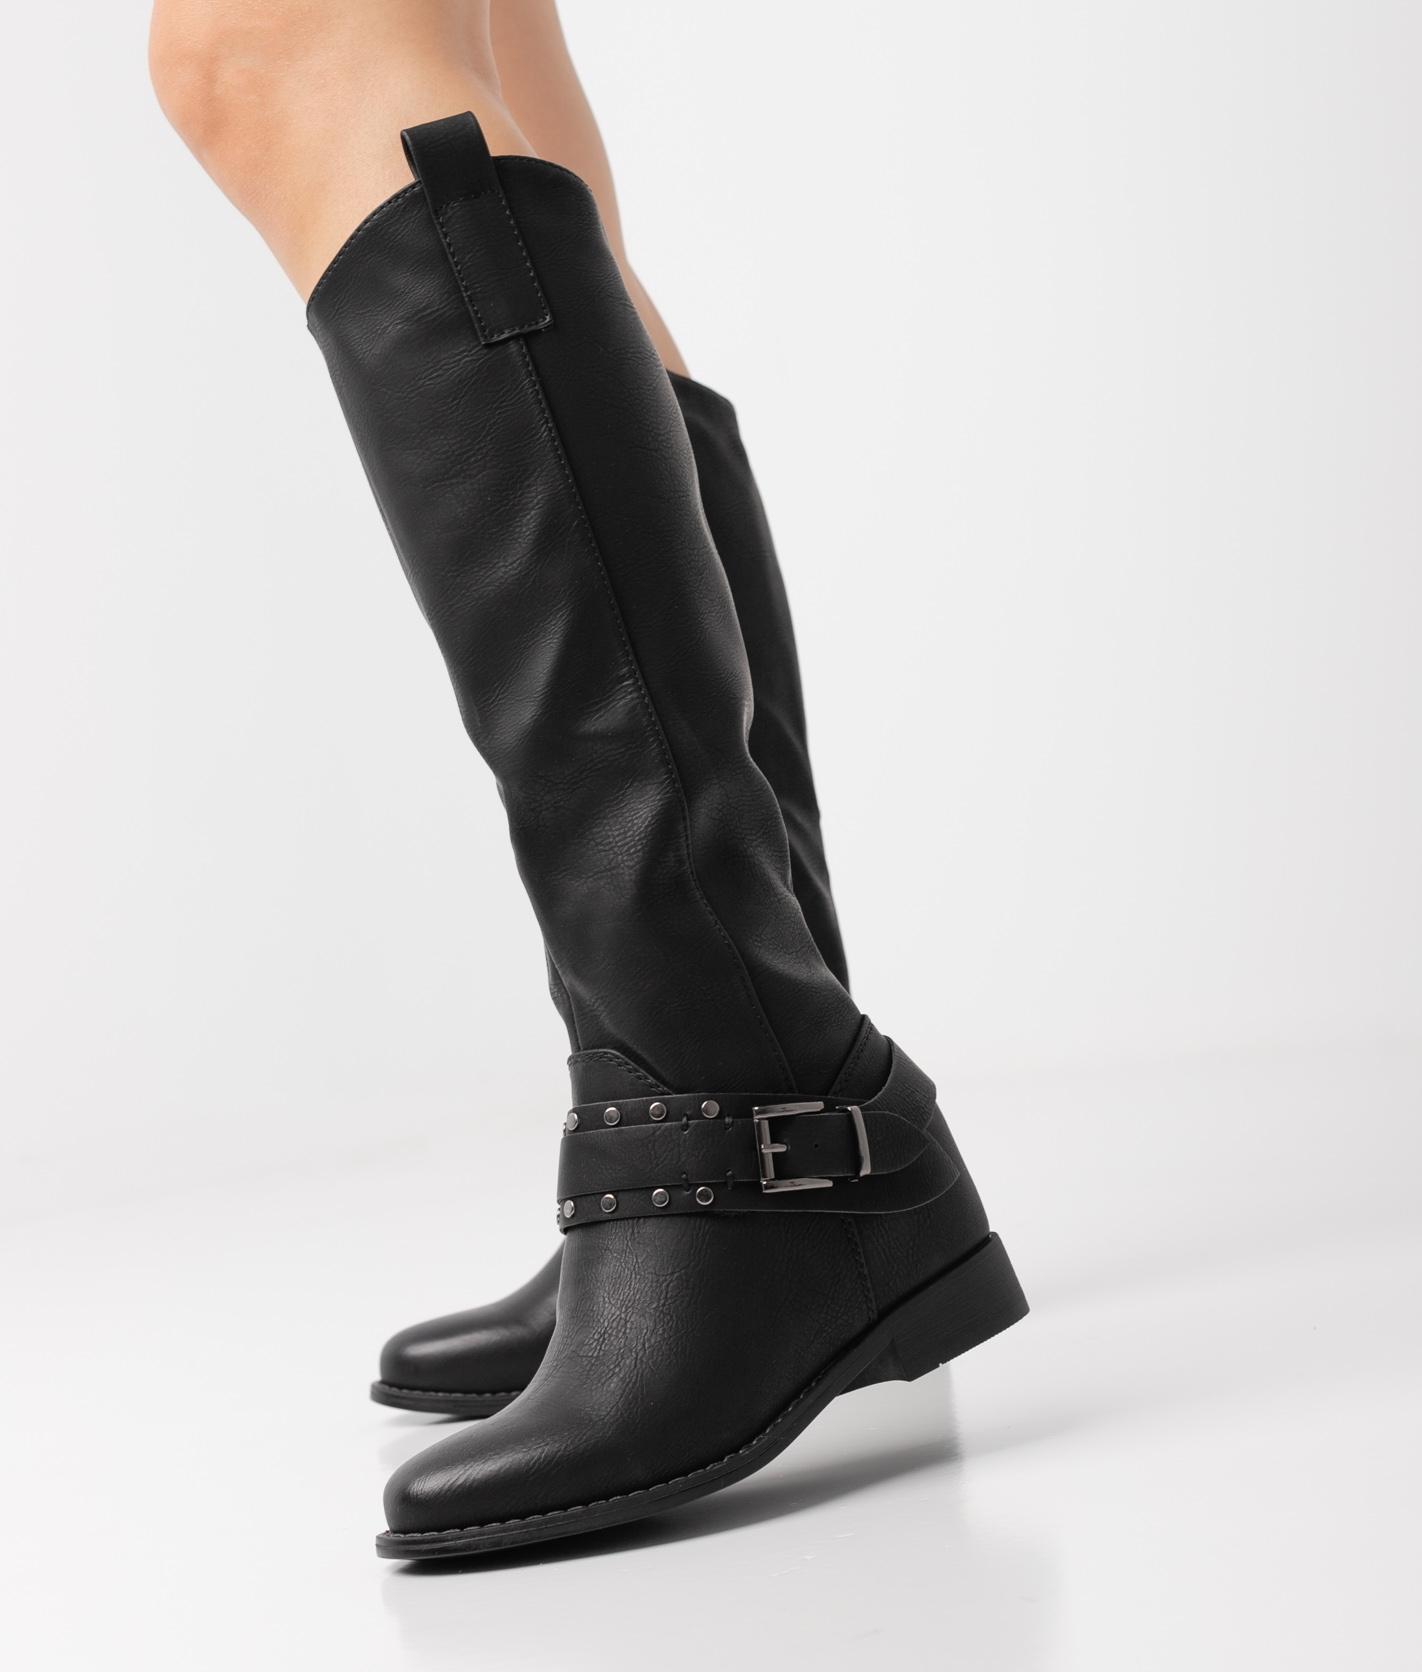 TULIN KNEE-LENGHT BOOT - BLACK